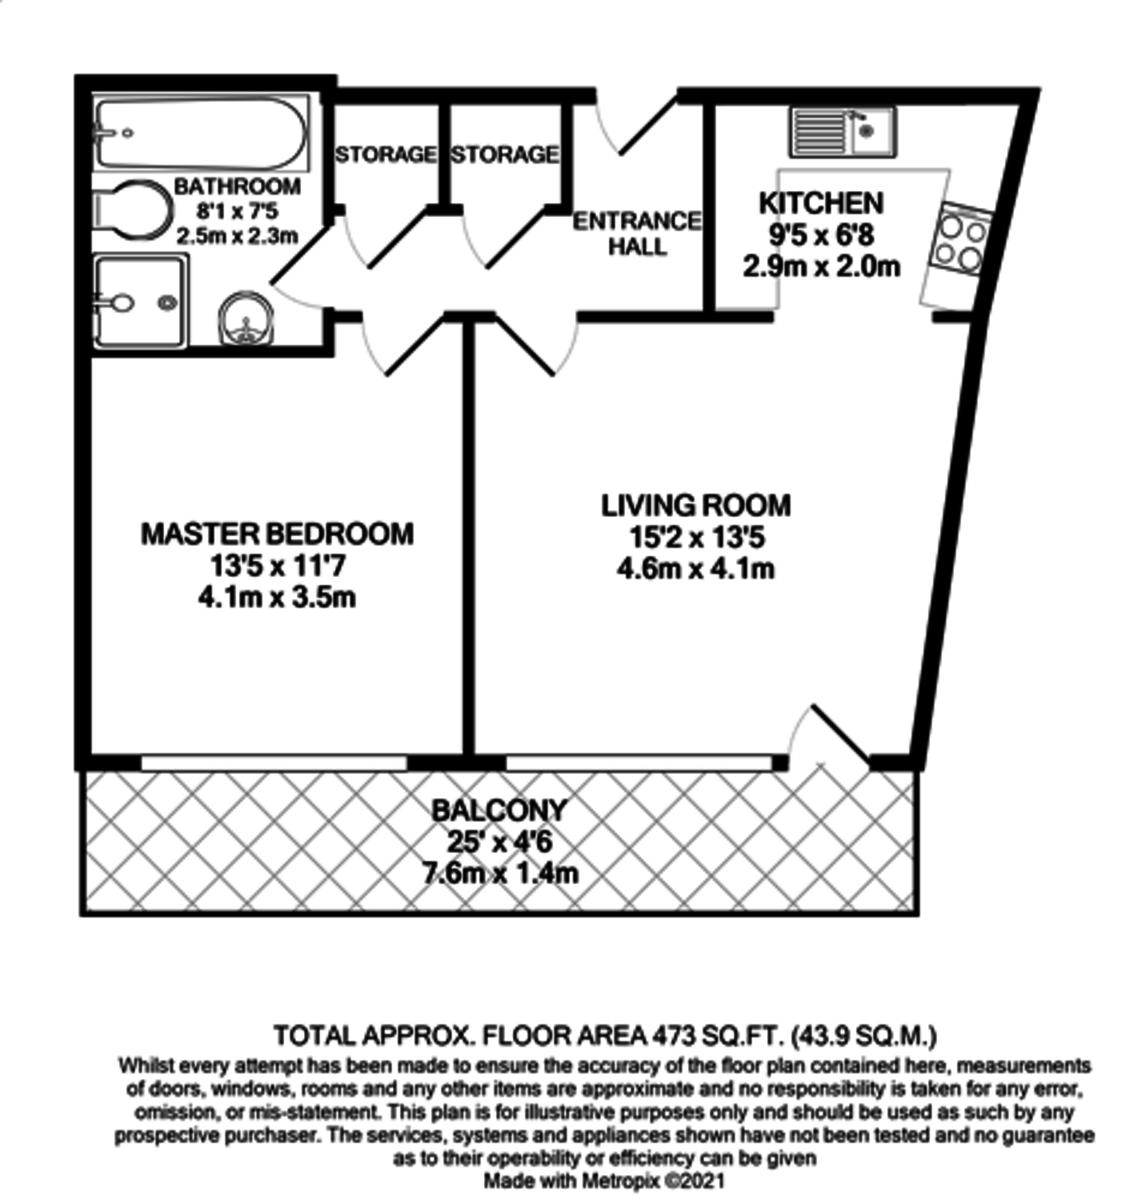 Longleat Avenue, Park Central, Birmingham City Centre floorplan 1 of 1